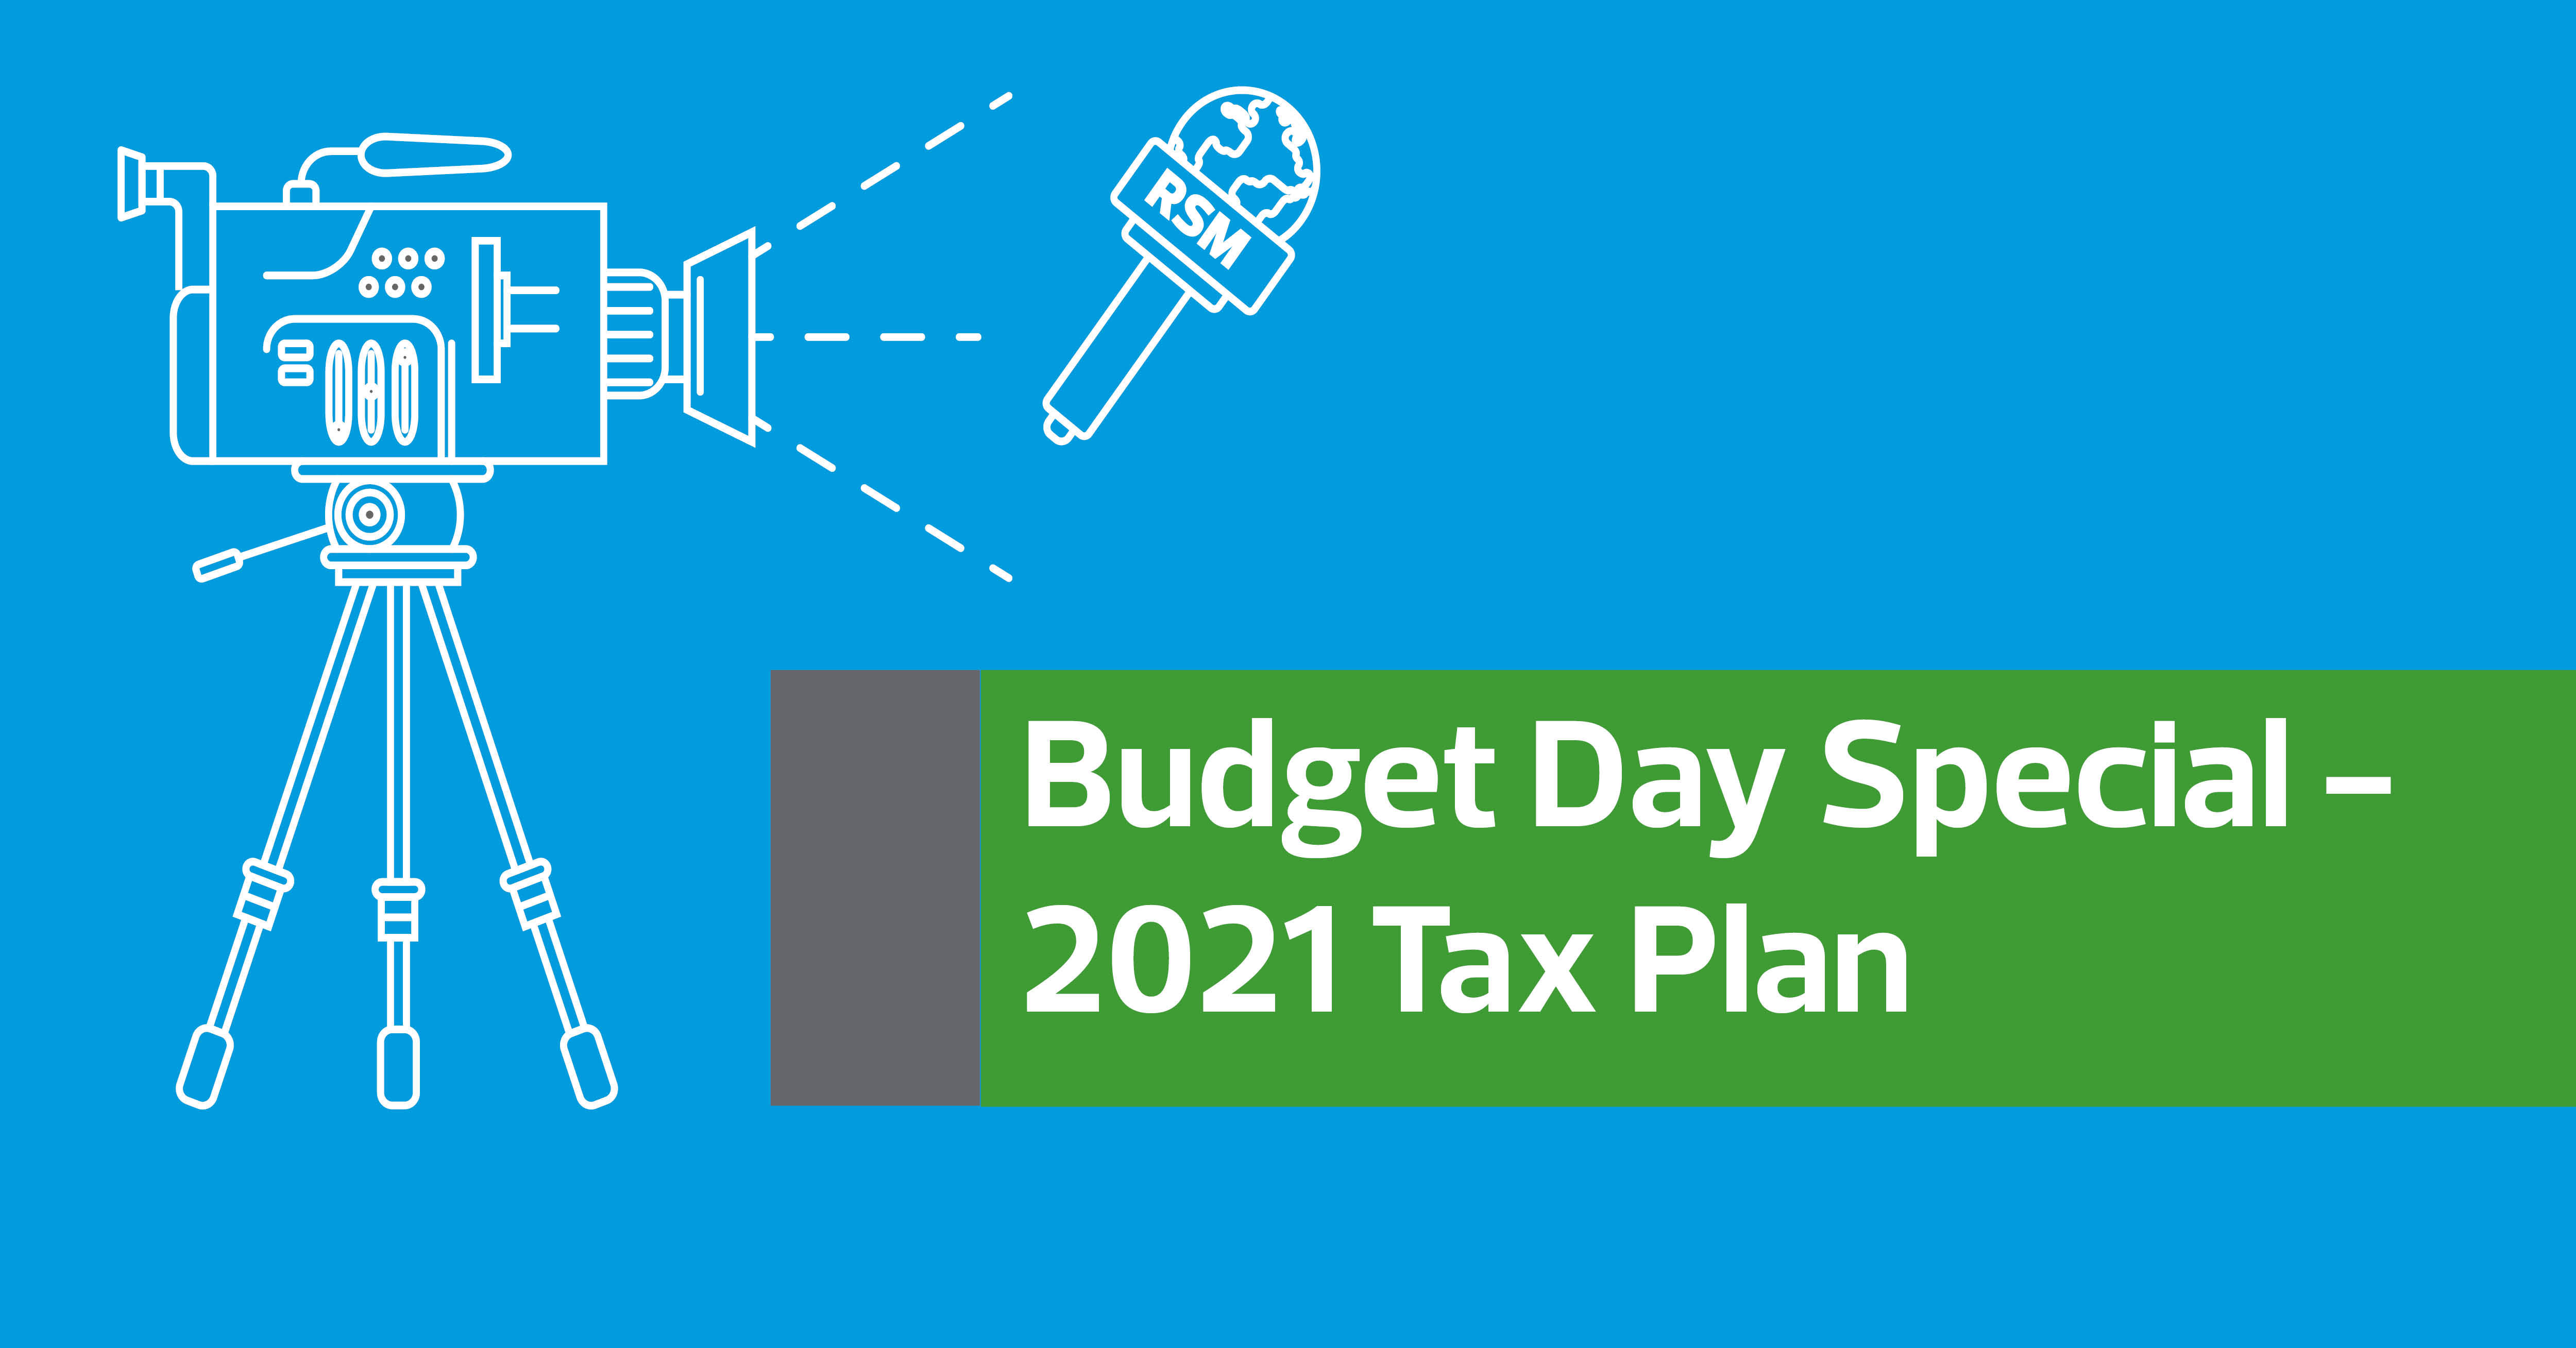 public://media/Nieuwsitems/2020/Prinsjesdag/20200921_budget_day_special_2021_tax_plan_website.jpg